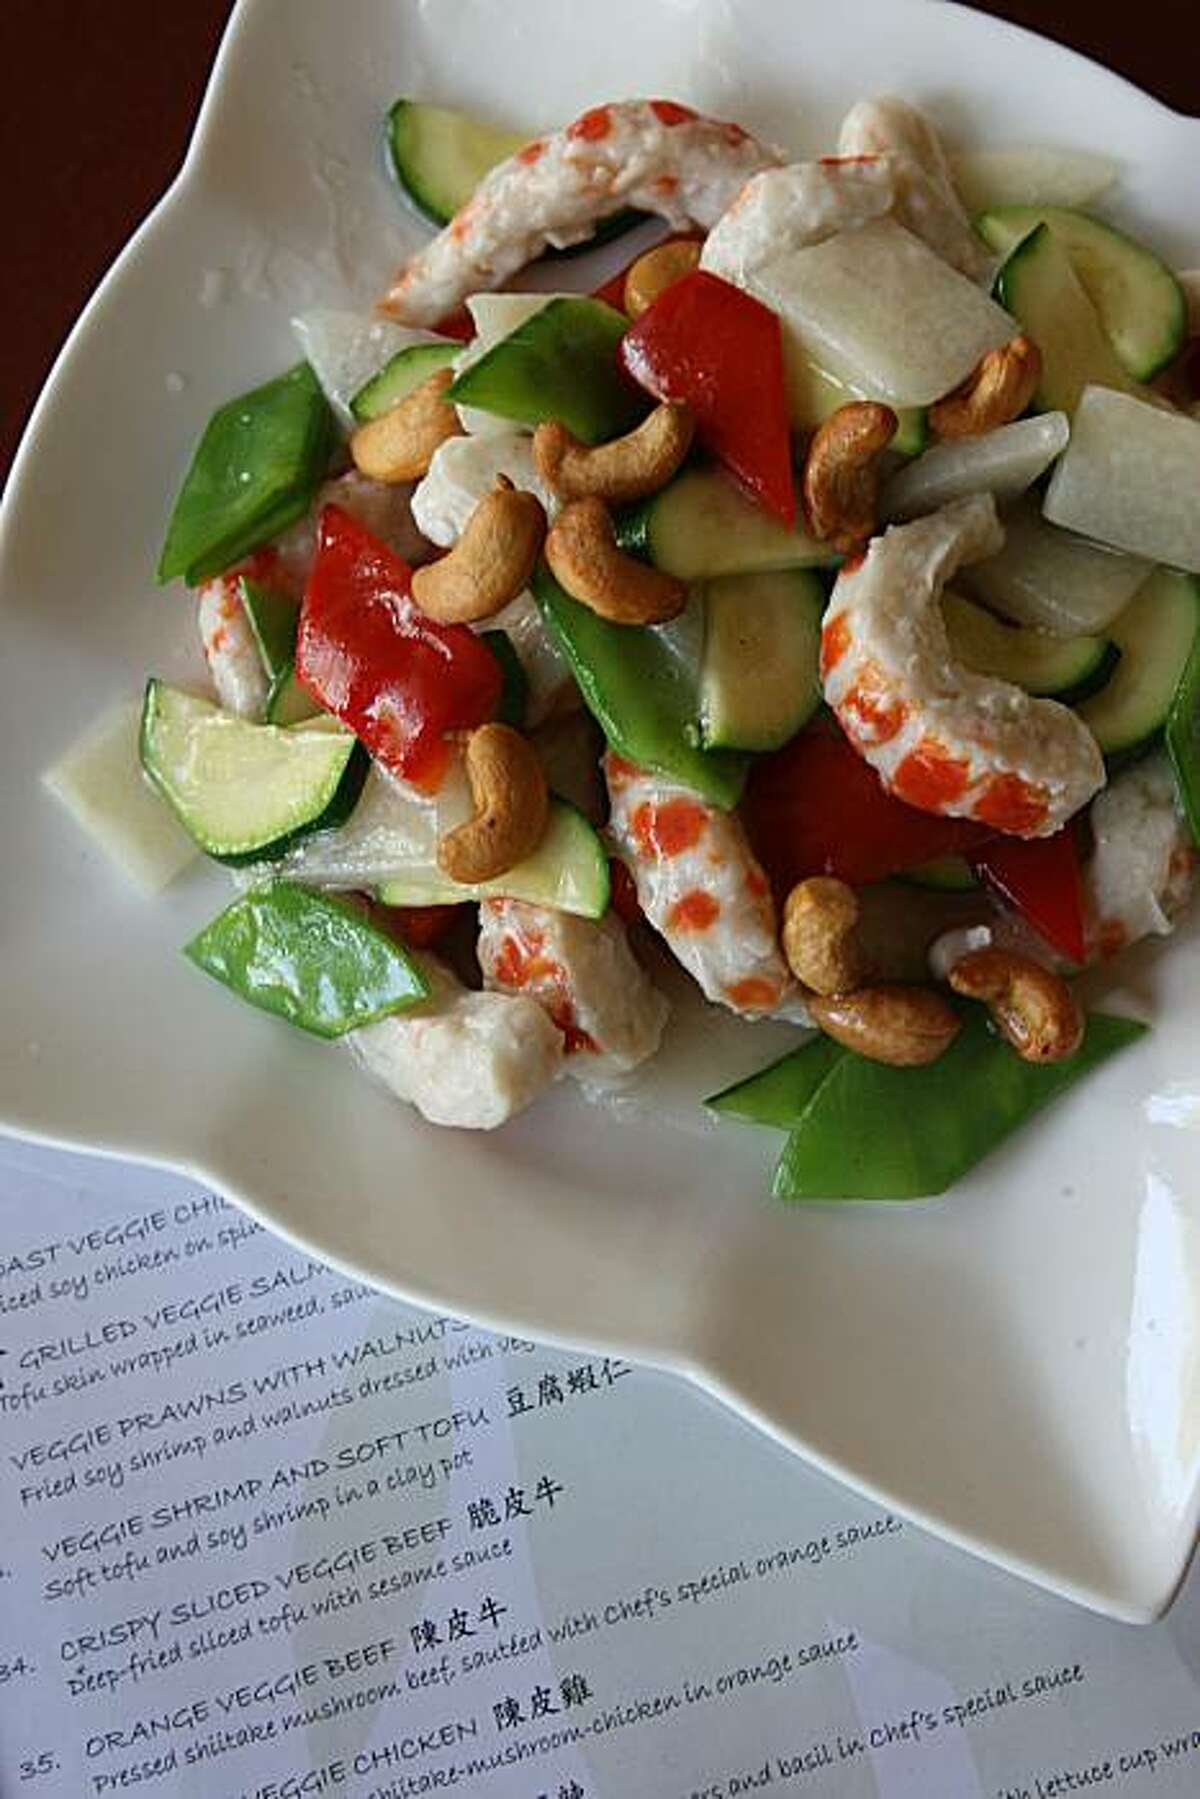 Cashew veggie shrimp at Garden Fresh, a vegan restaurant in Palo Alto, Calif., on Tuesday, August 3, 2010.